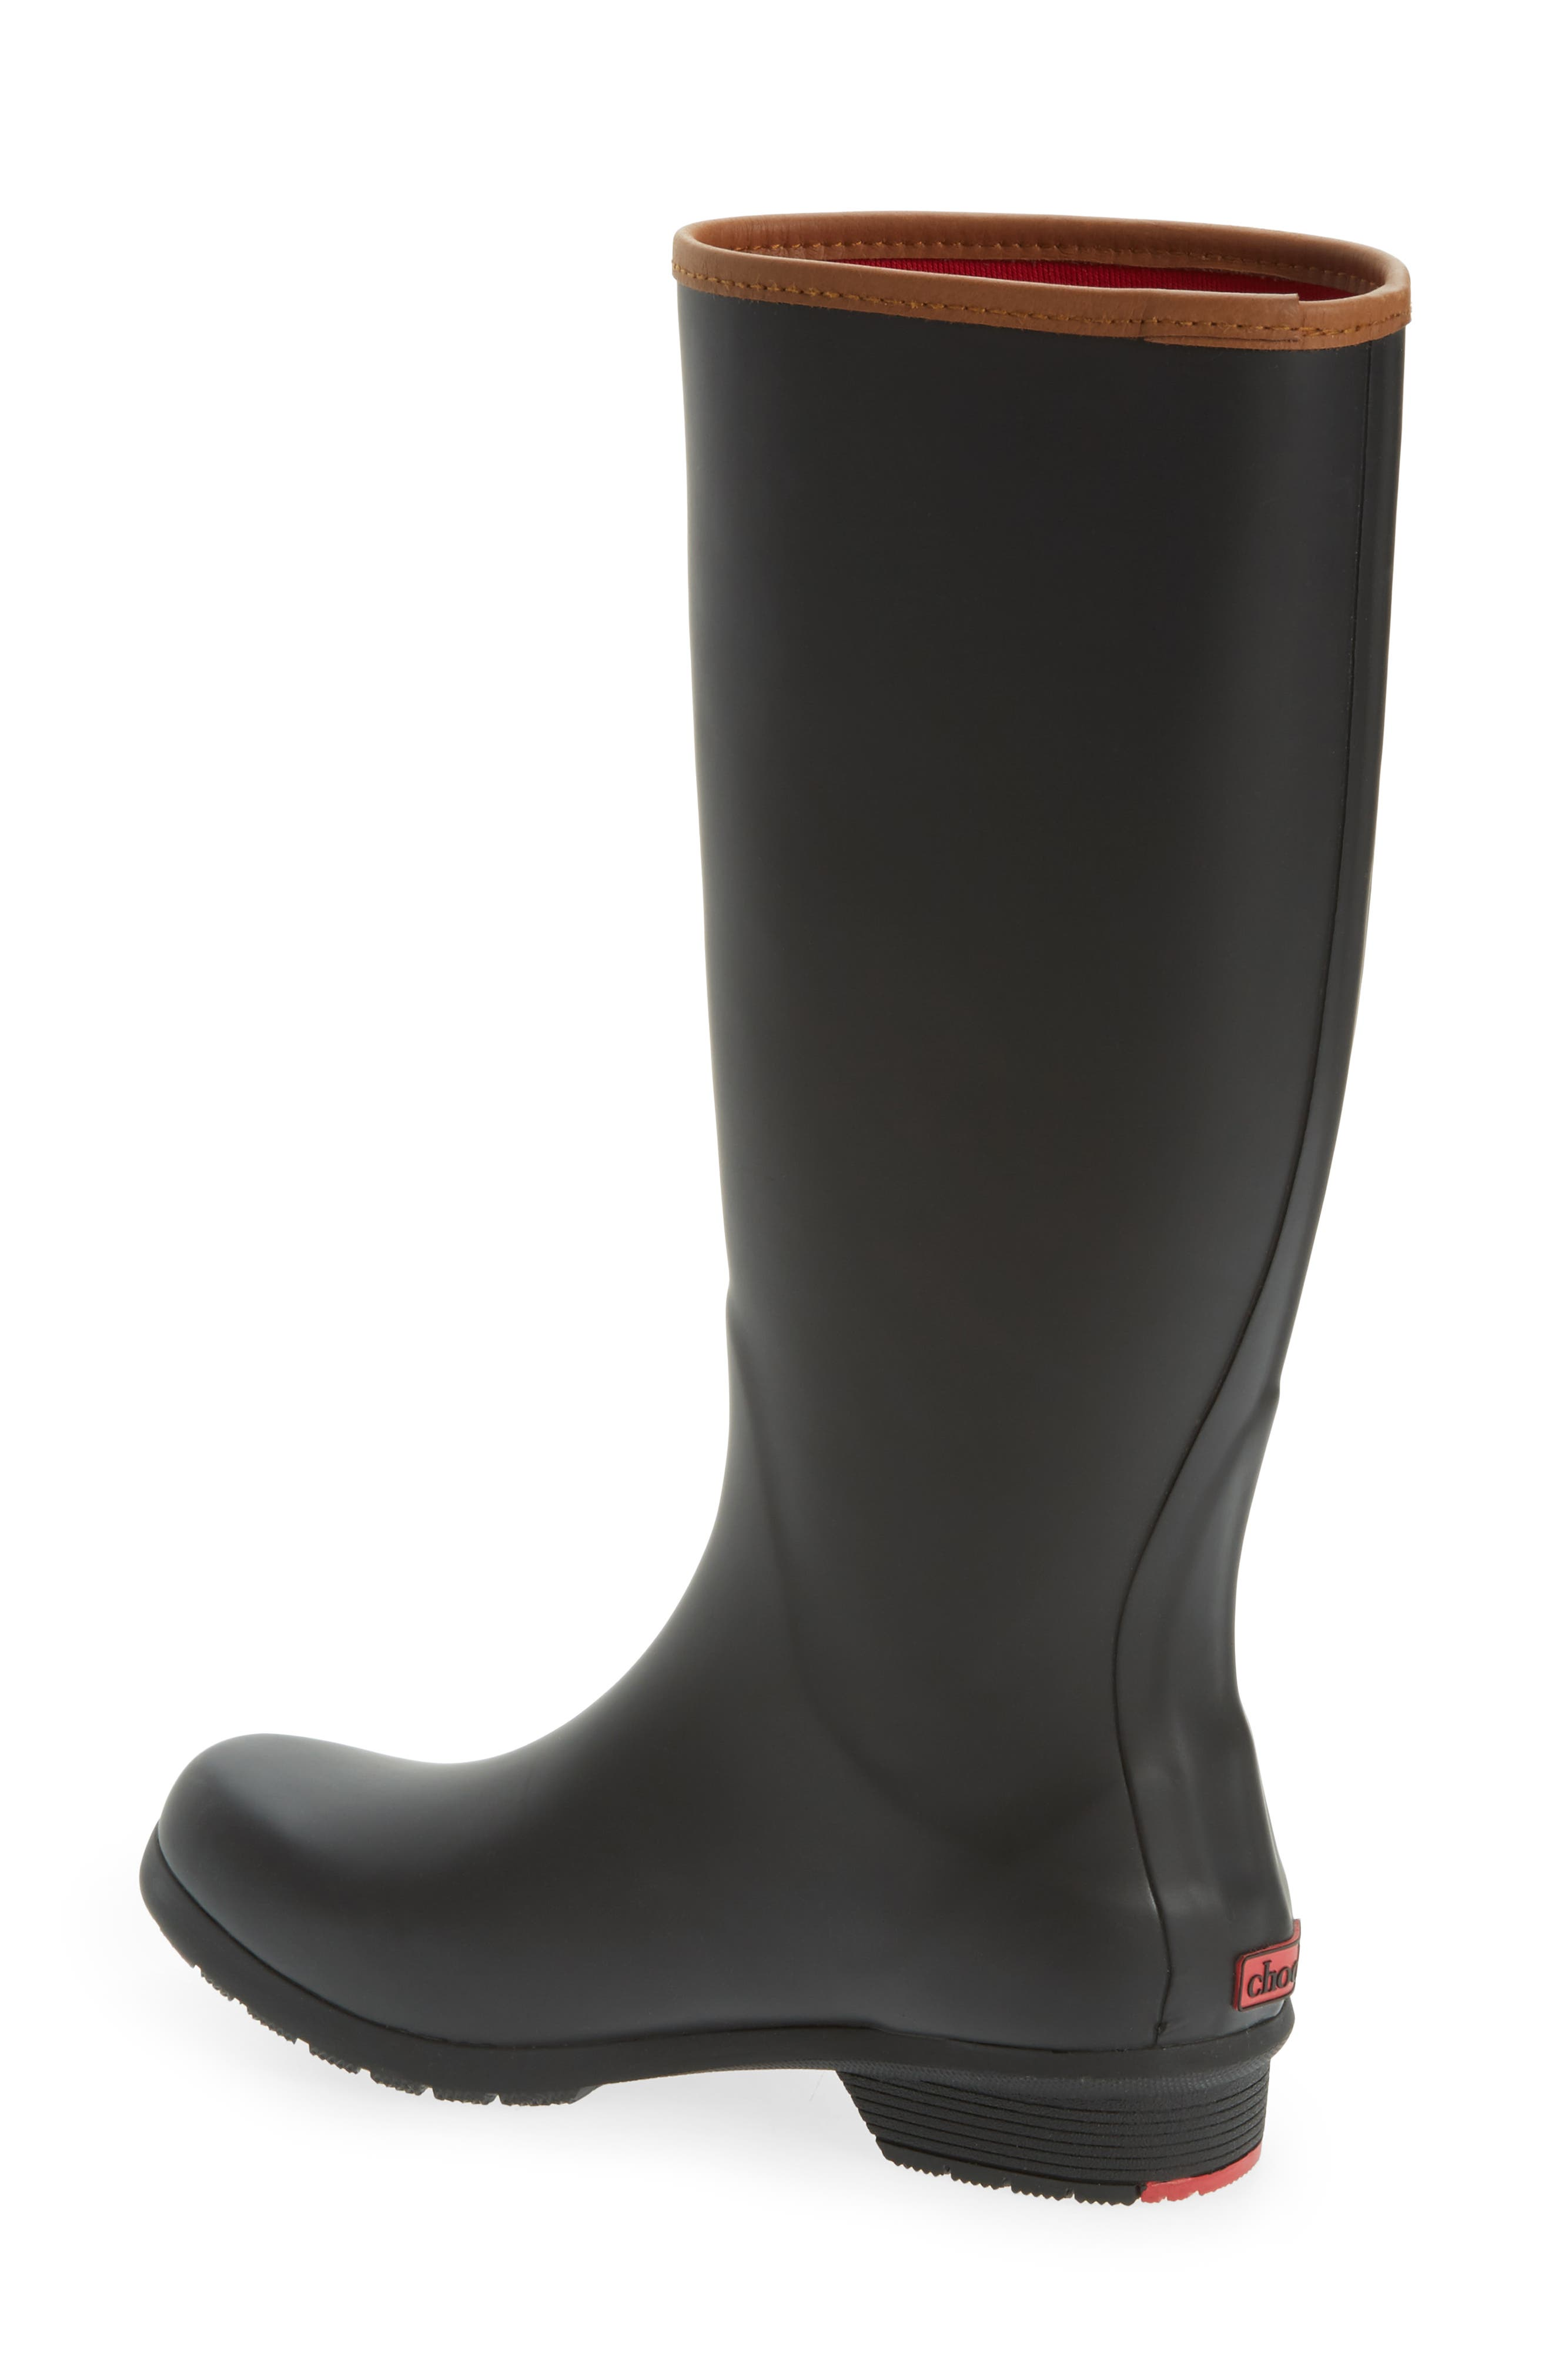 Alternate Image 2  - Chooka City Tall Rain Boot (Women)